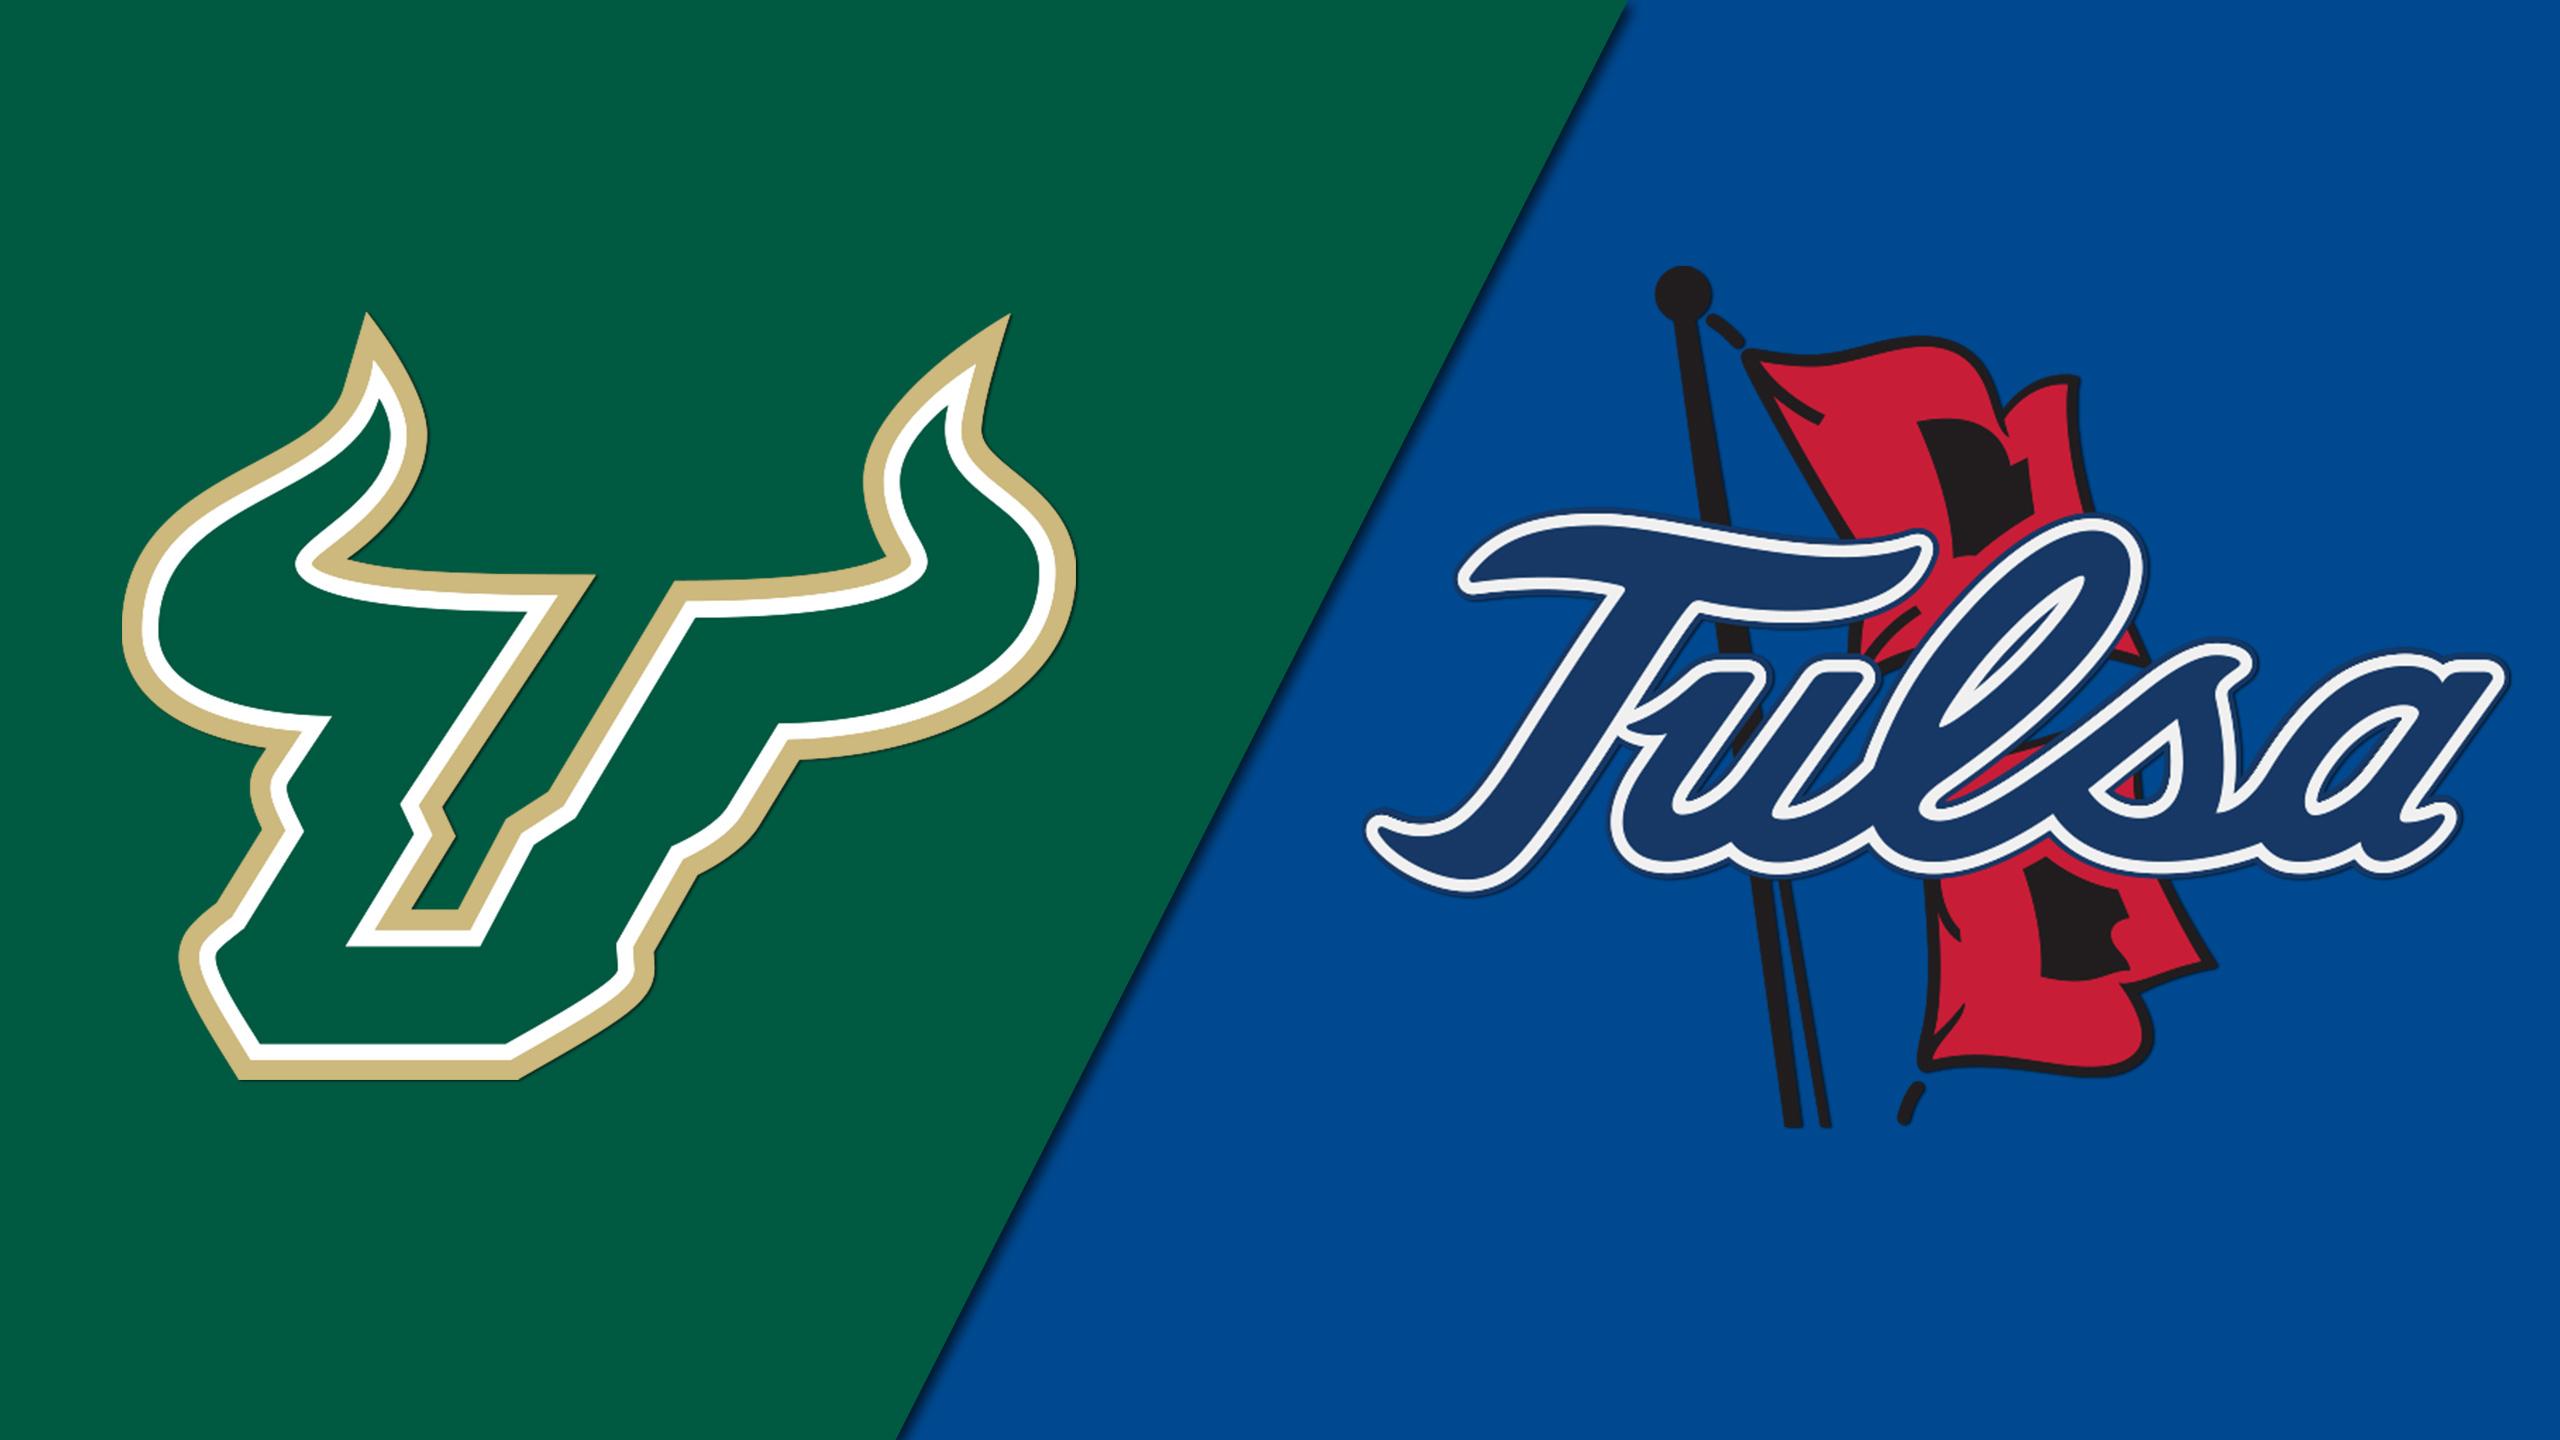 In Spanish - #23 South Florida vs. Tulsa (Football)